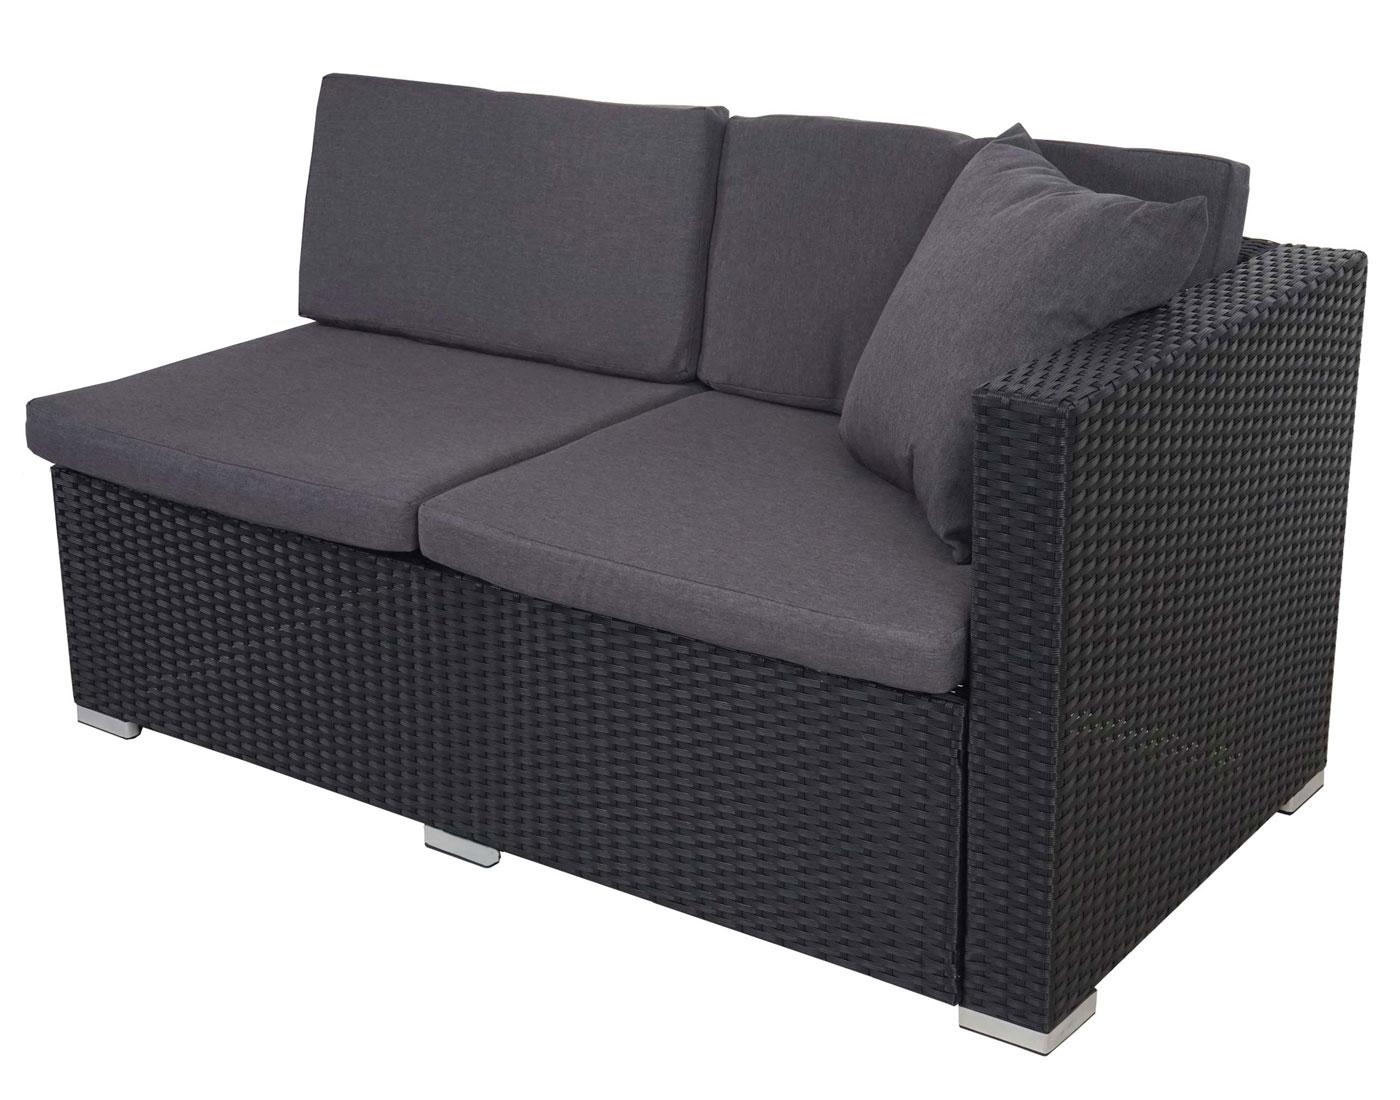 poly rattan sofa garnitur sitzgruppe lounge set alu anthrazit kissen anthrazit garten. Black Bedroom Furniture Sets. Home Design Ideas